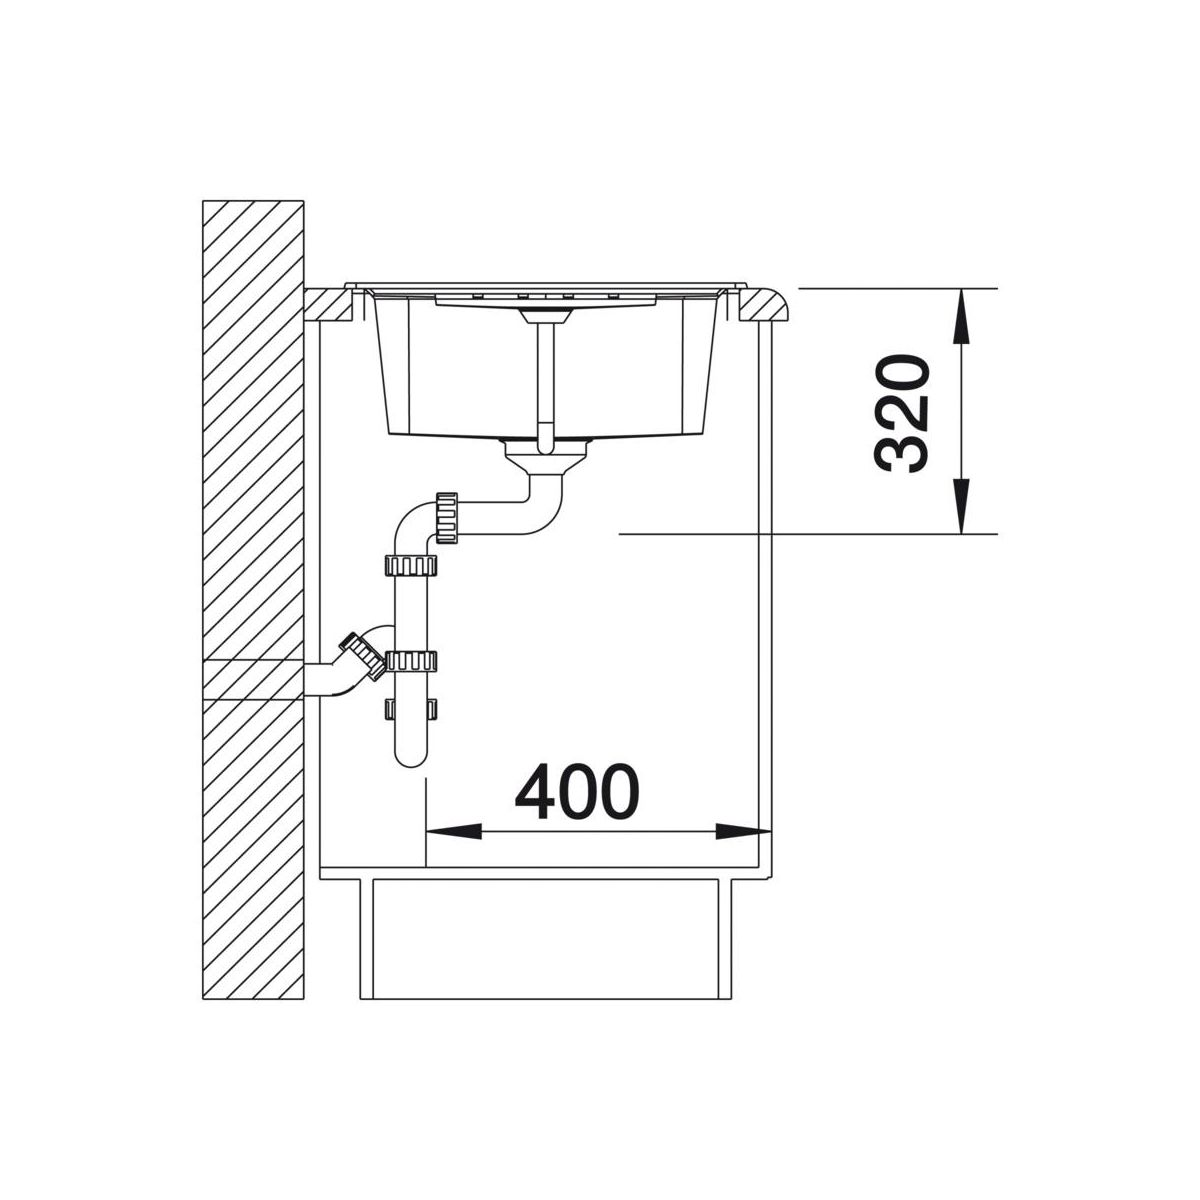 zlewozmywak lexa 45 s 86 cm blanco sprawd opinie w leroy merlin. Black Bedroom Furniture Sets. Home Design Ideas